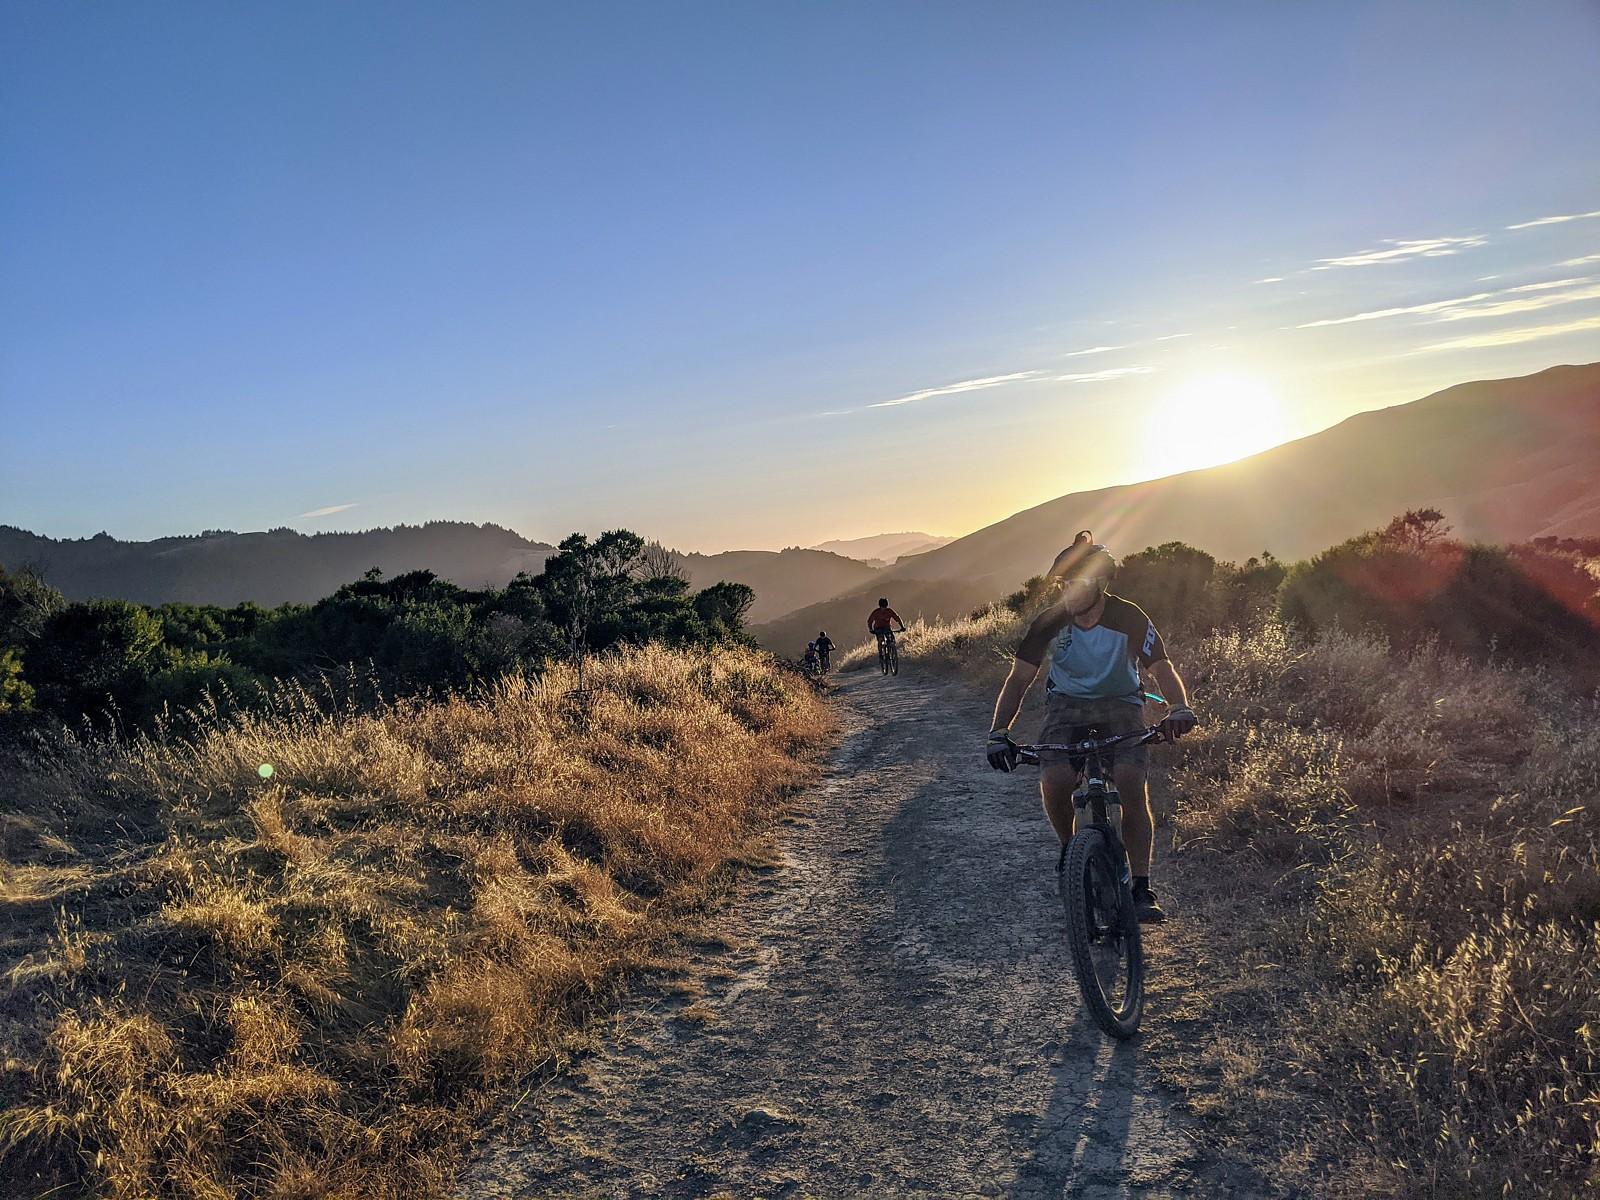 Early Evening Ride - coyoterun - Mountain Biking Pictures - Vital MTB